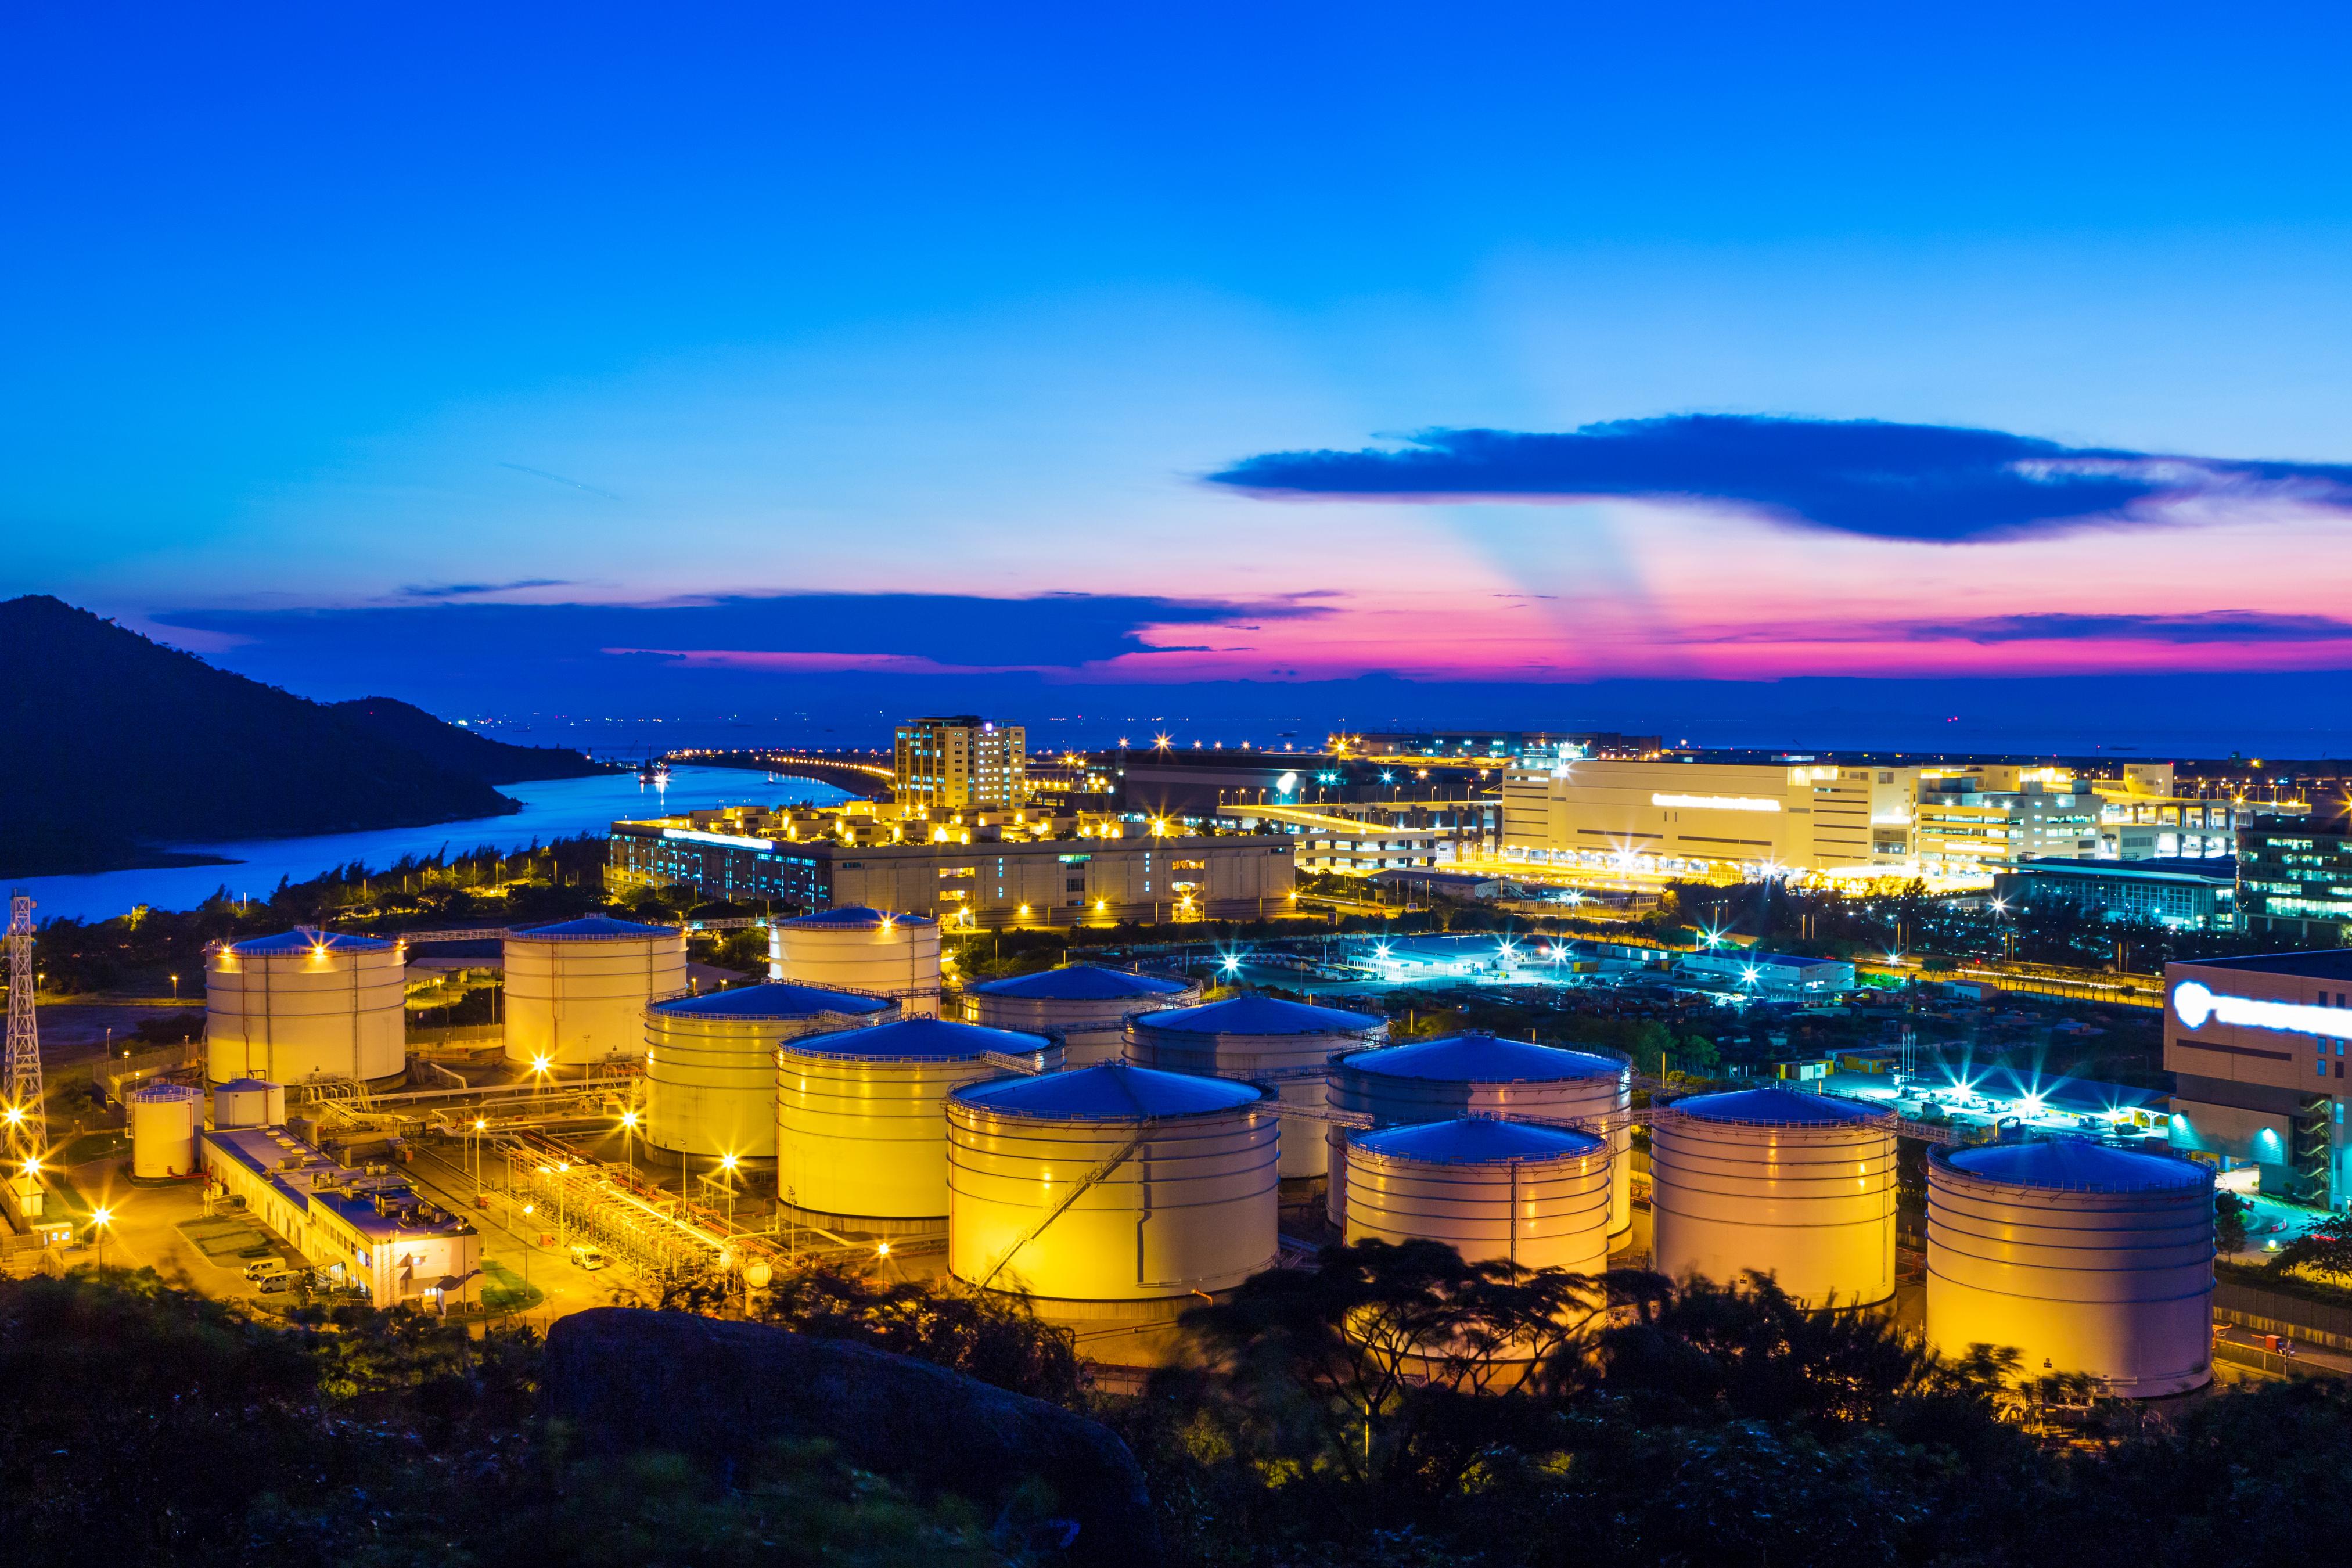 Oil tank in the twilight